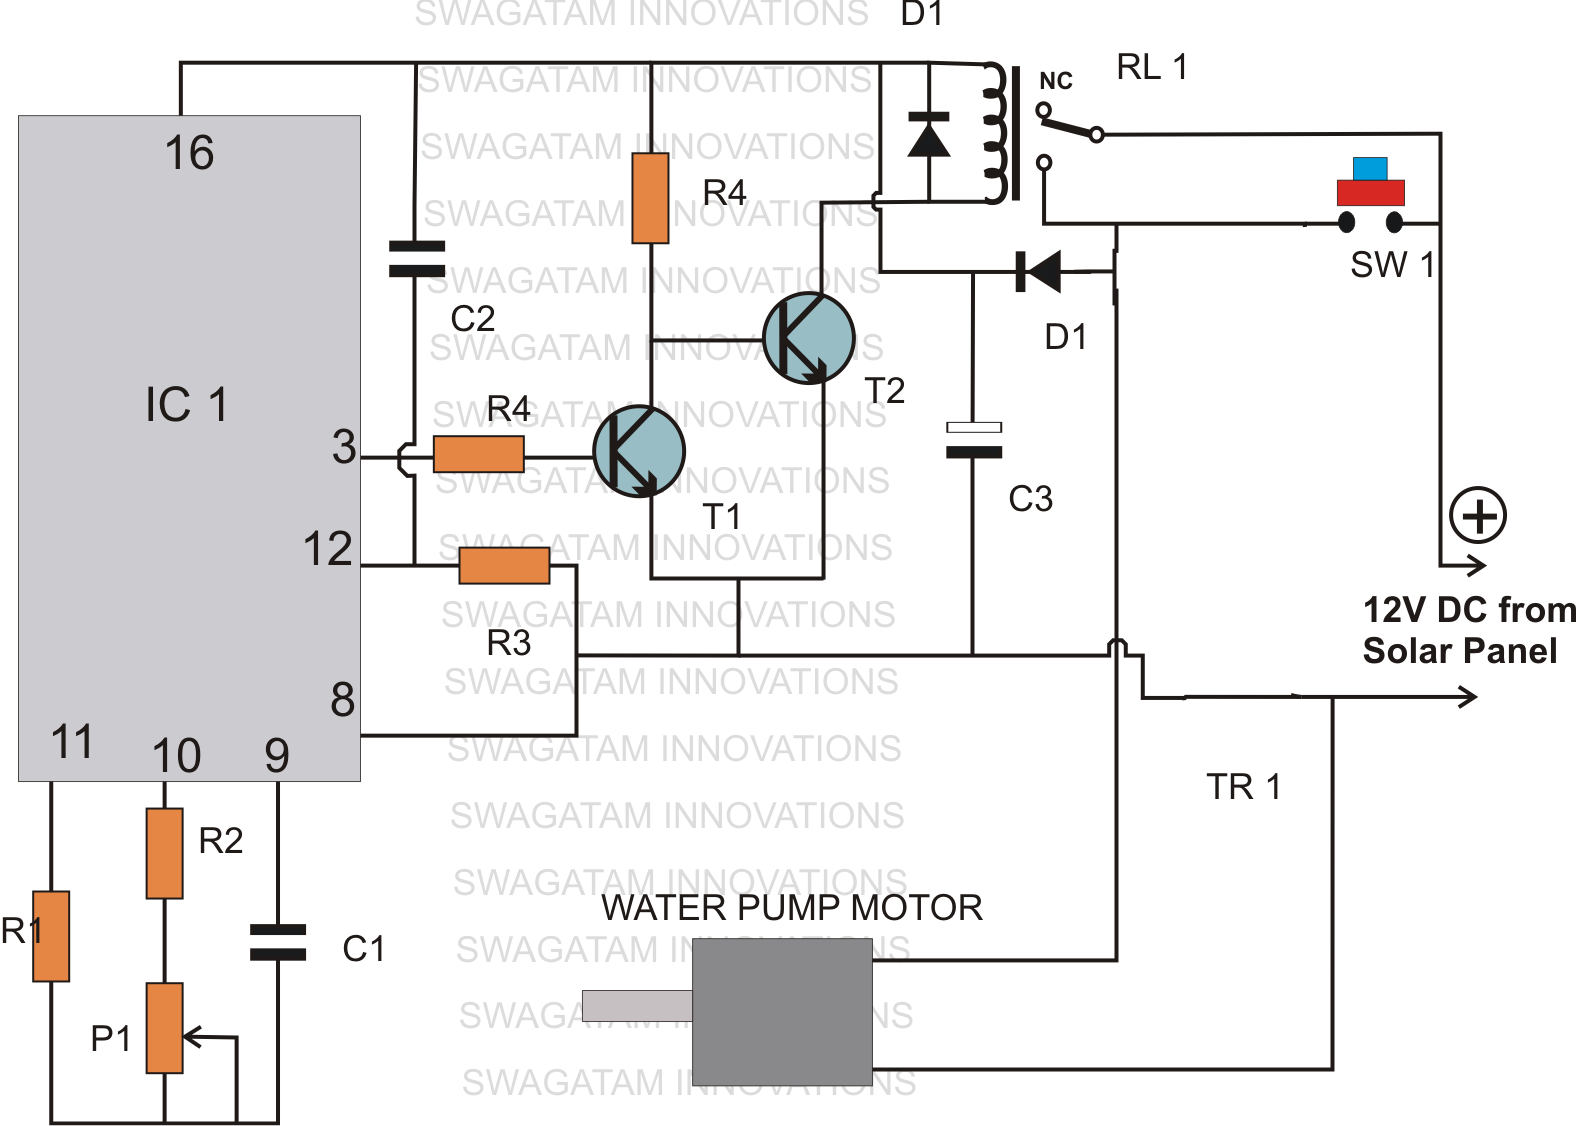 medium resolution of pacific hydrostar water pump wiring diagrams wiring library rh 47 yoobi de deep water well jet pumps pacific hydrostar 1 hp shallow well pump